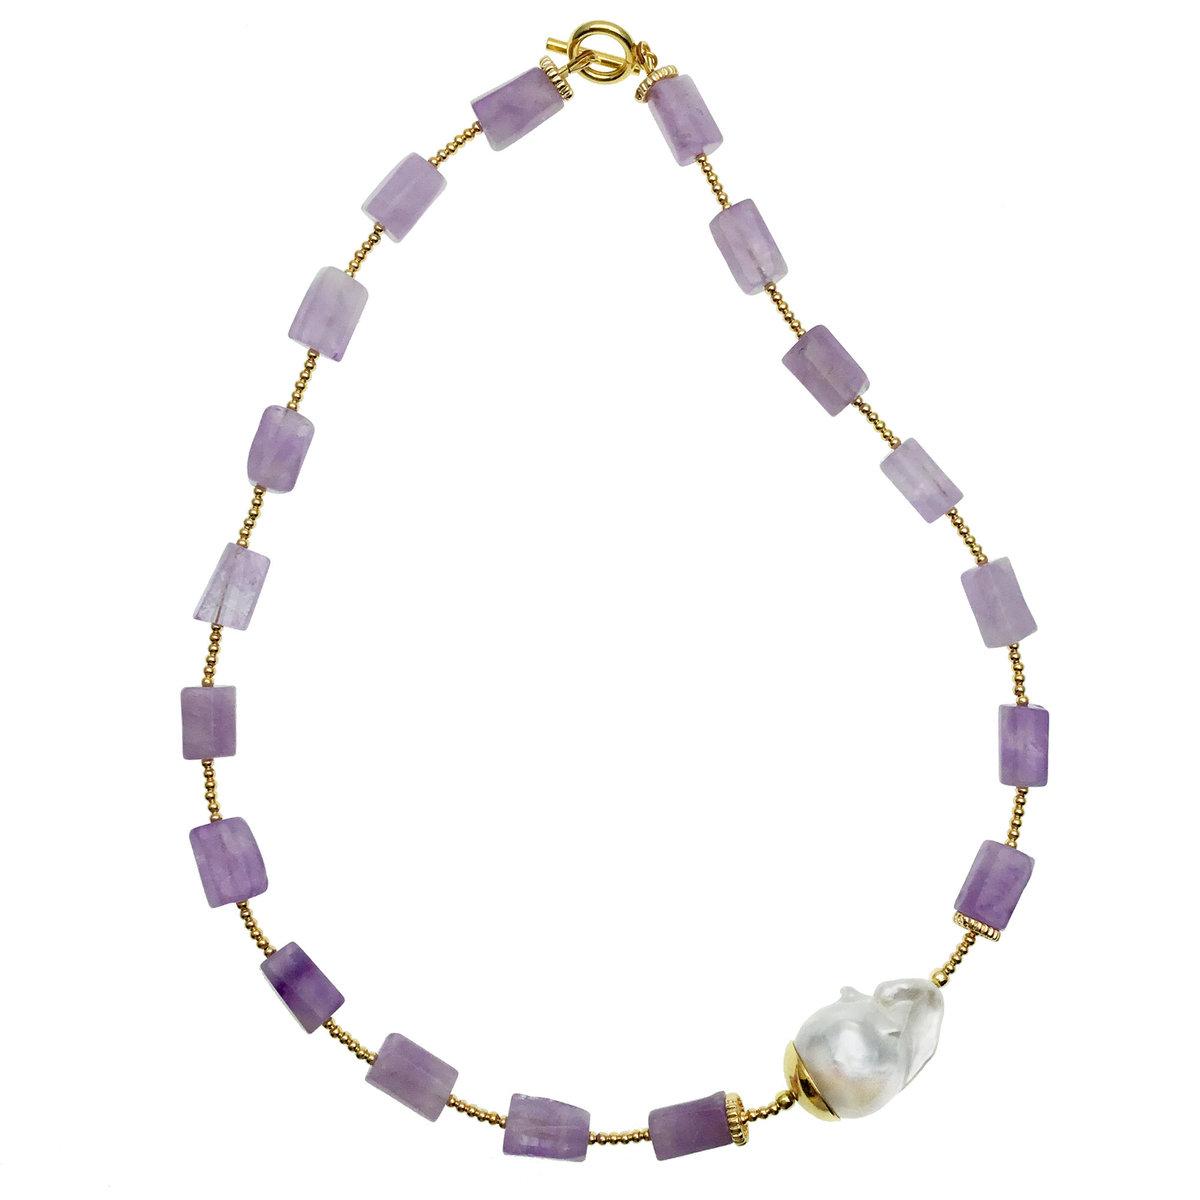 Natural Amethyst & Baroque Simple Necklace